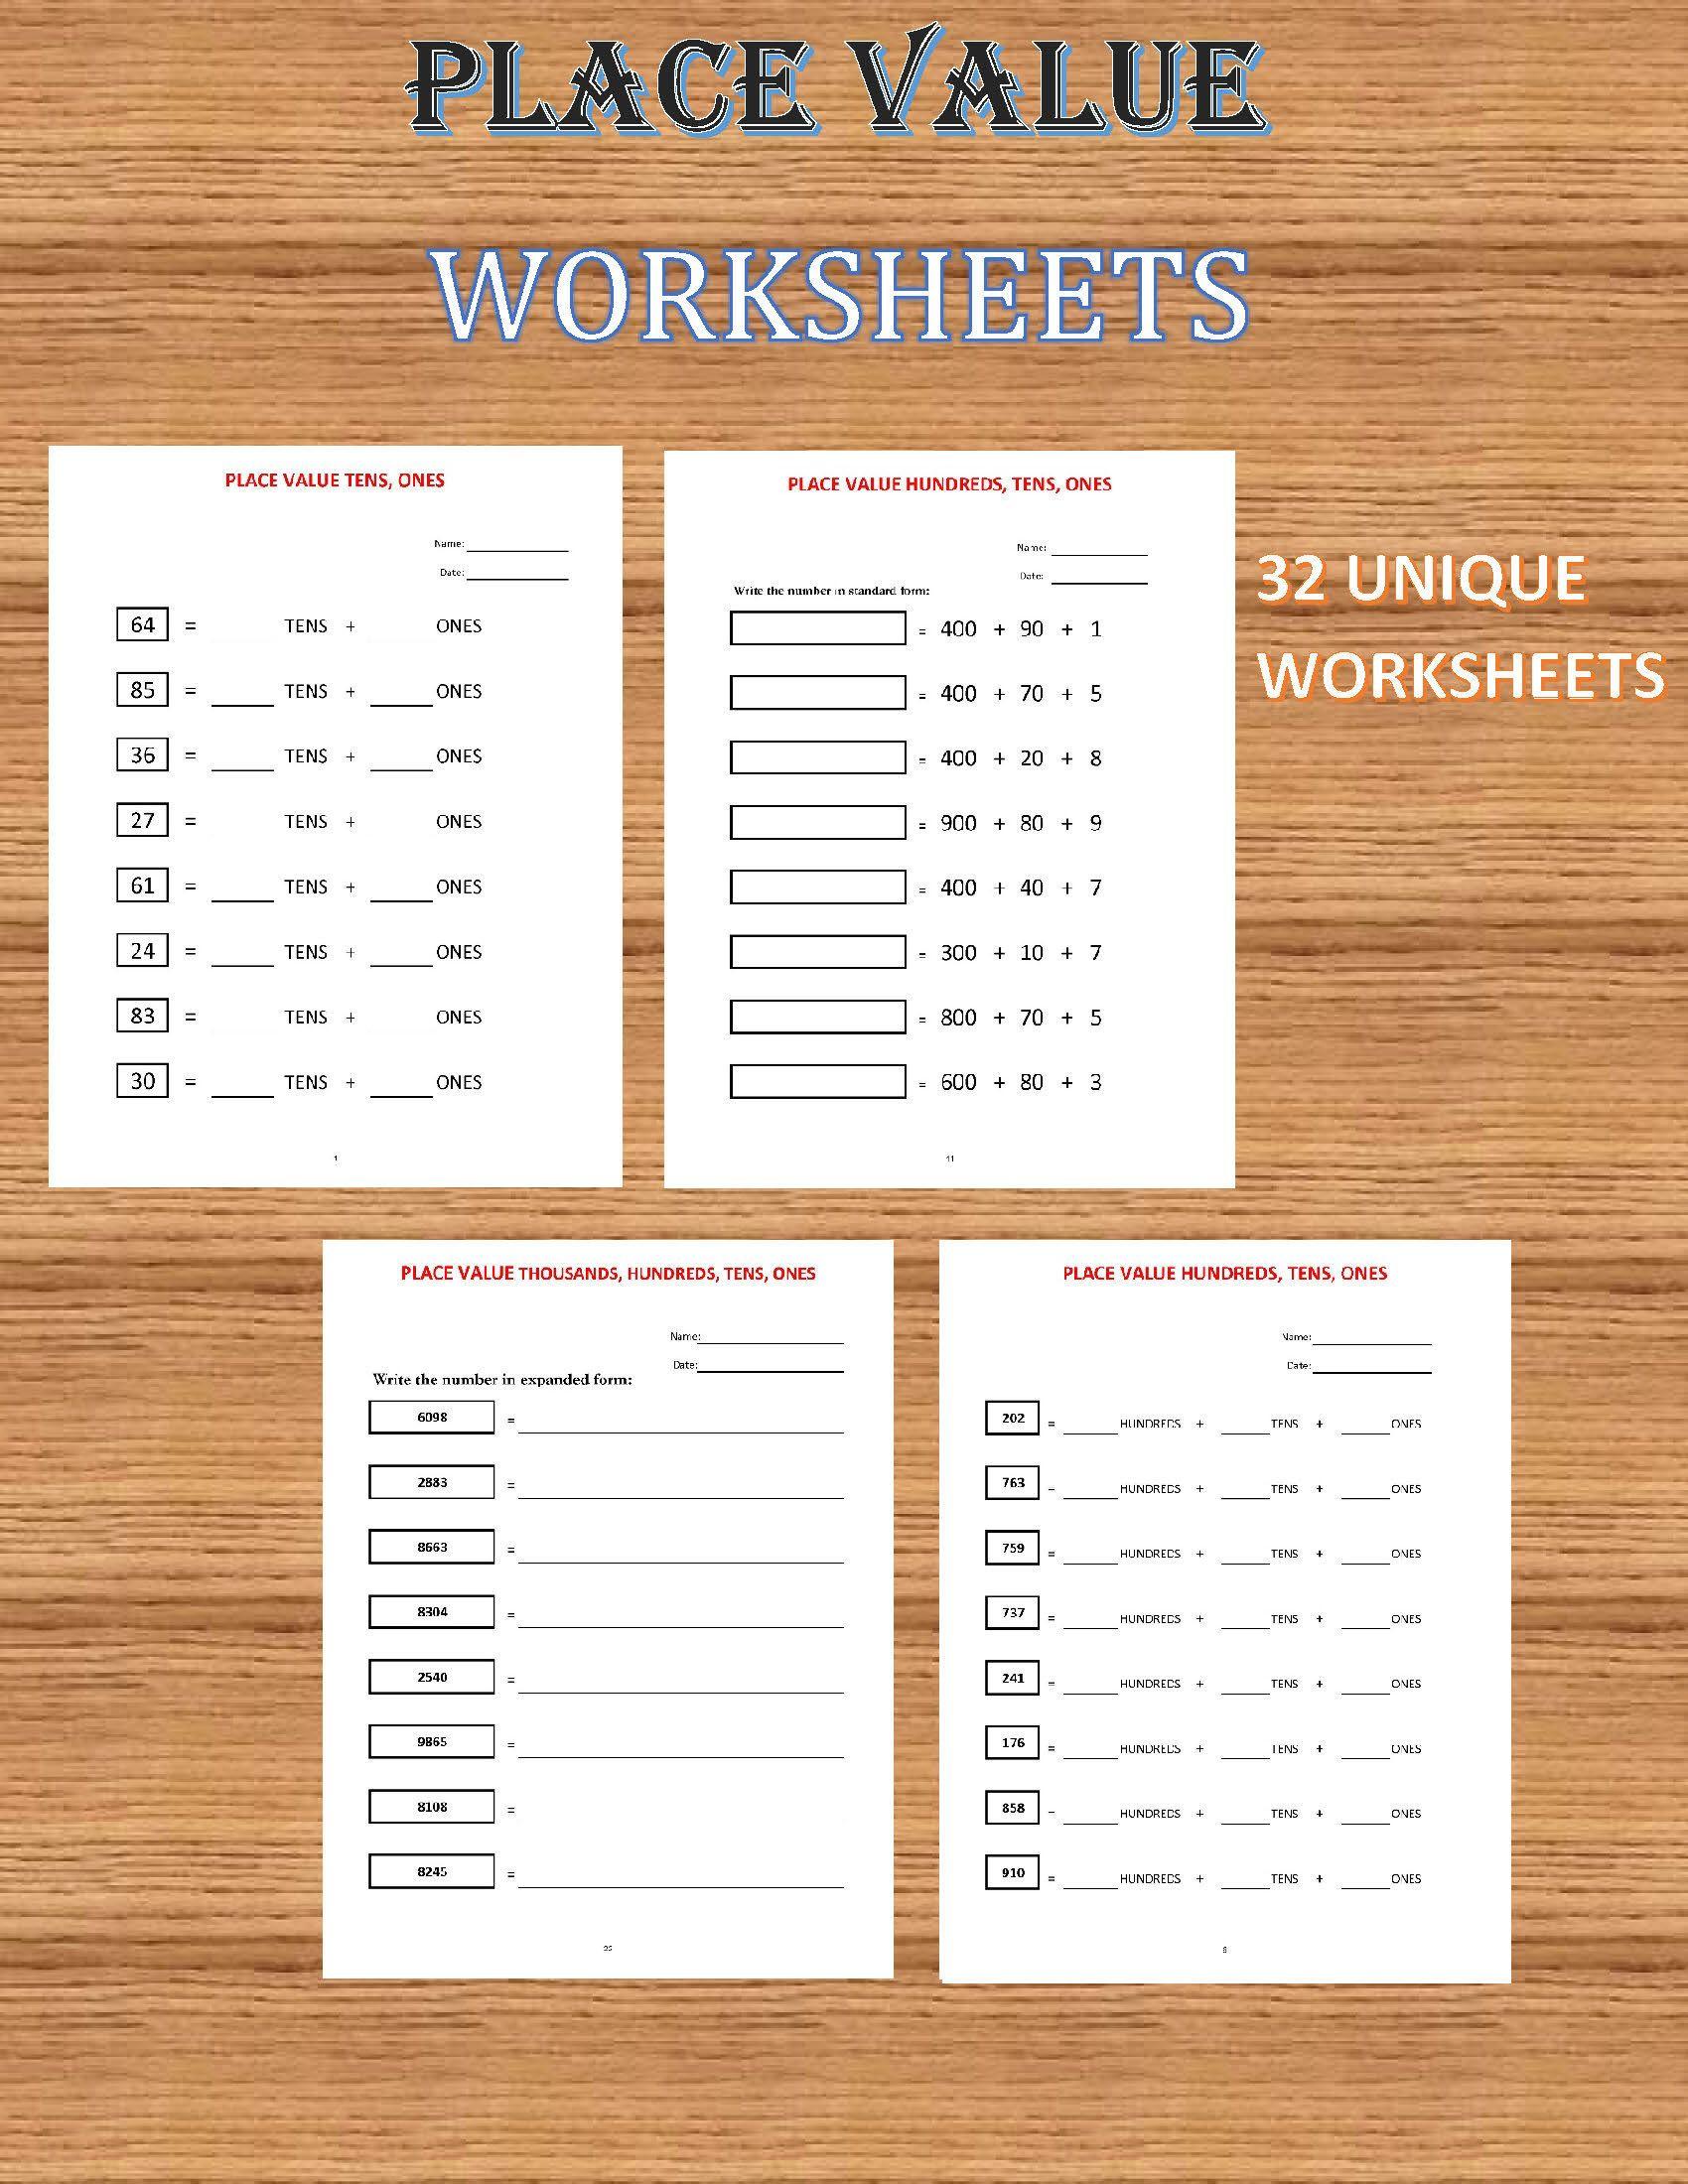 Place Value Worksheets 32 Worksheets Pdf Year 1 2 3 Etsy Place Value Worksheets Kids Math Worksheets Math For Kids [ 2200 x 1700 Pixel ]